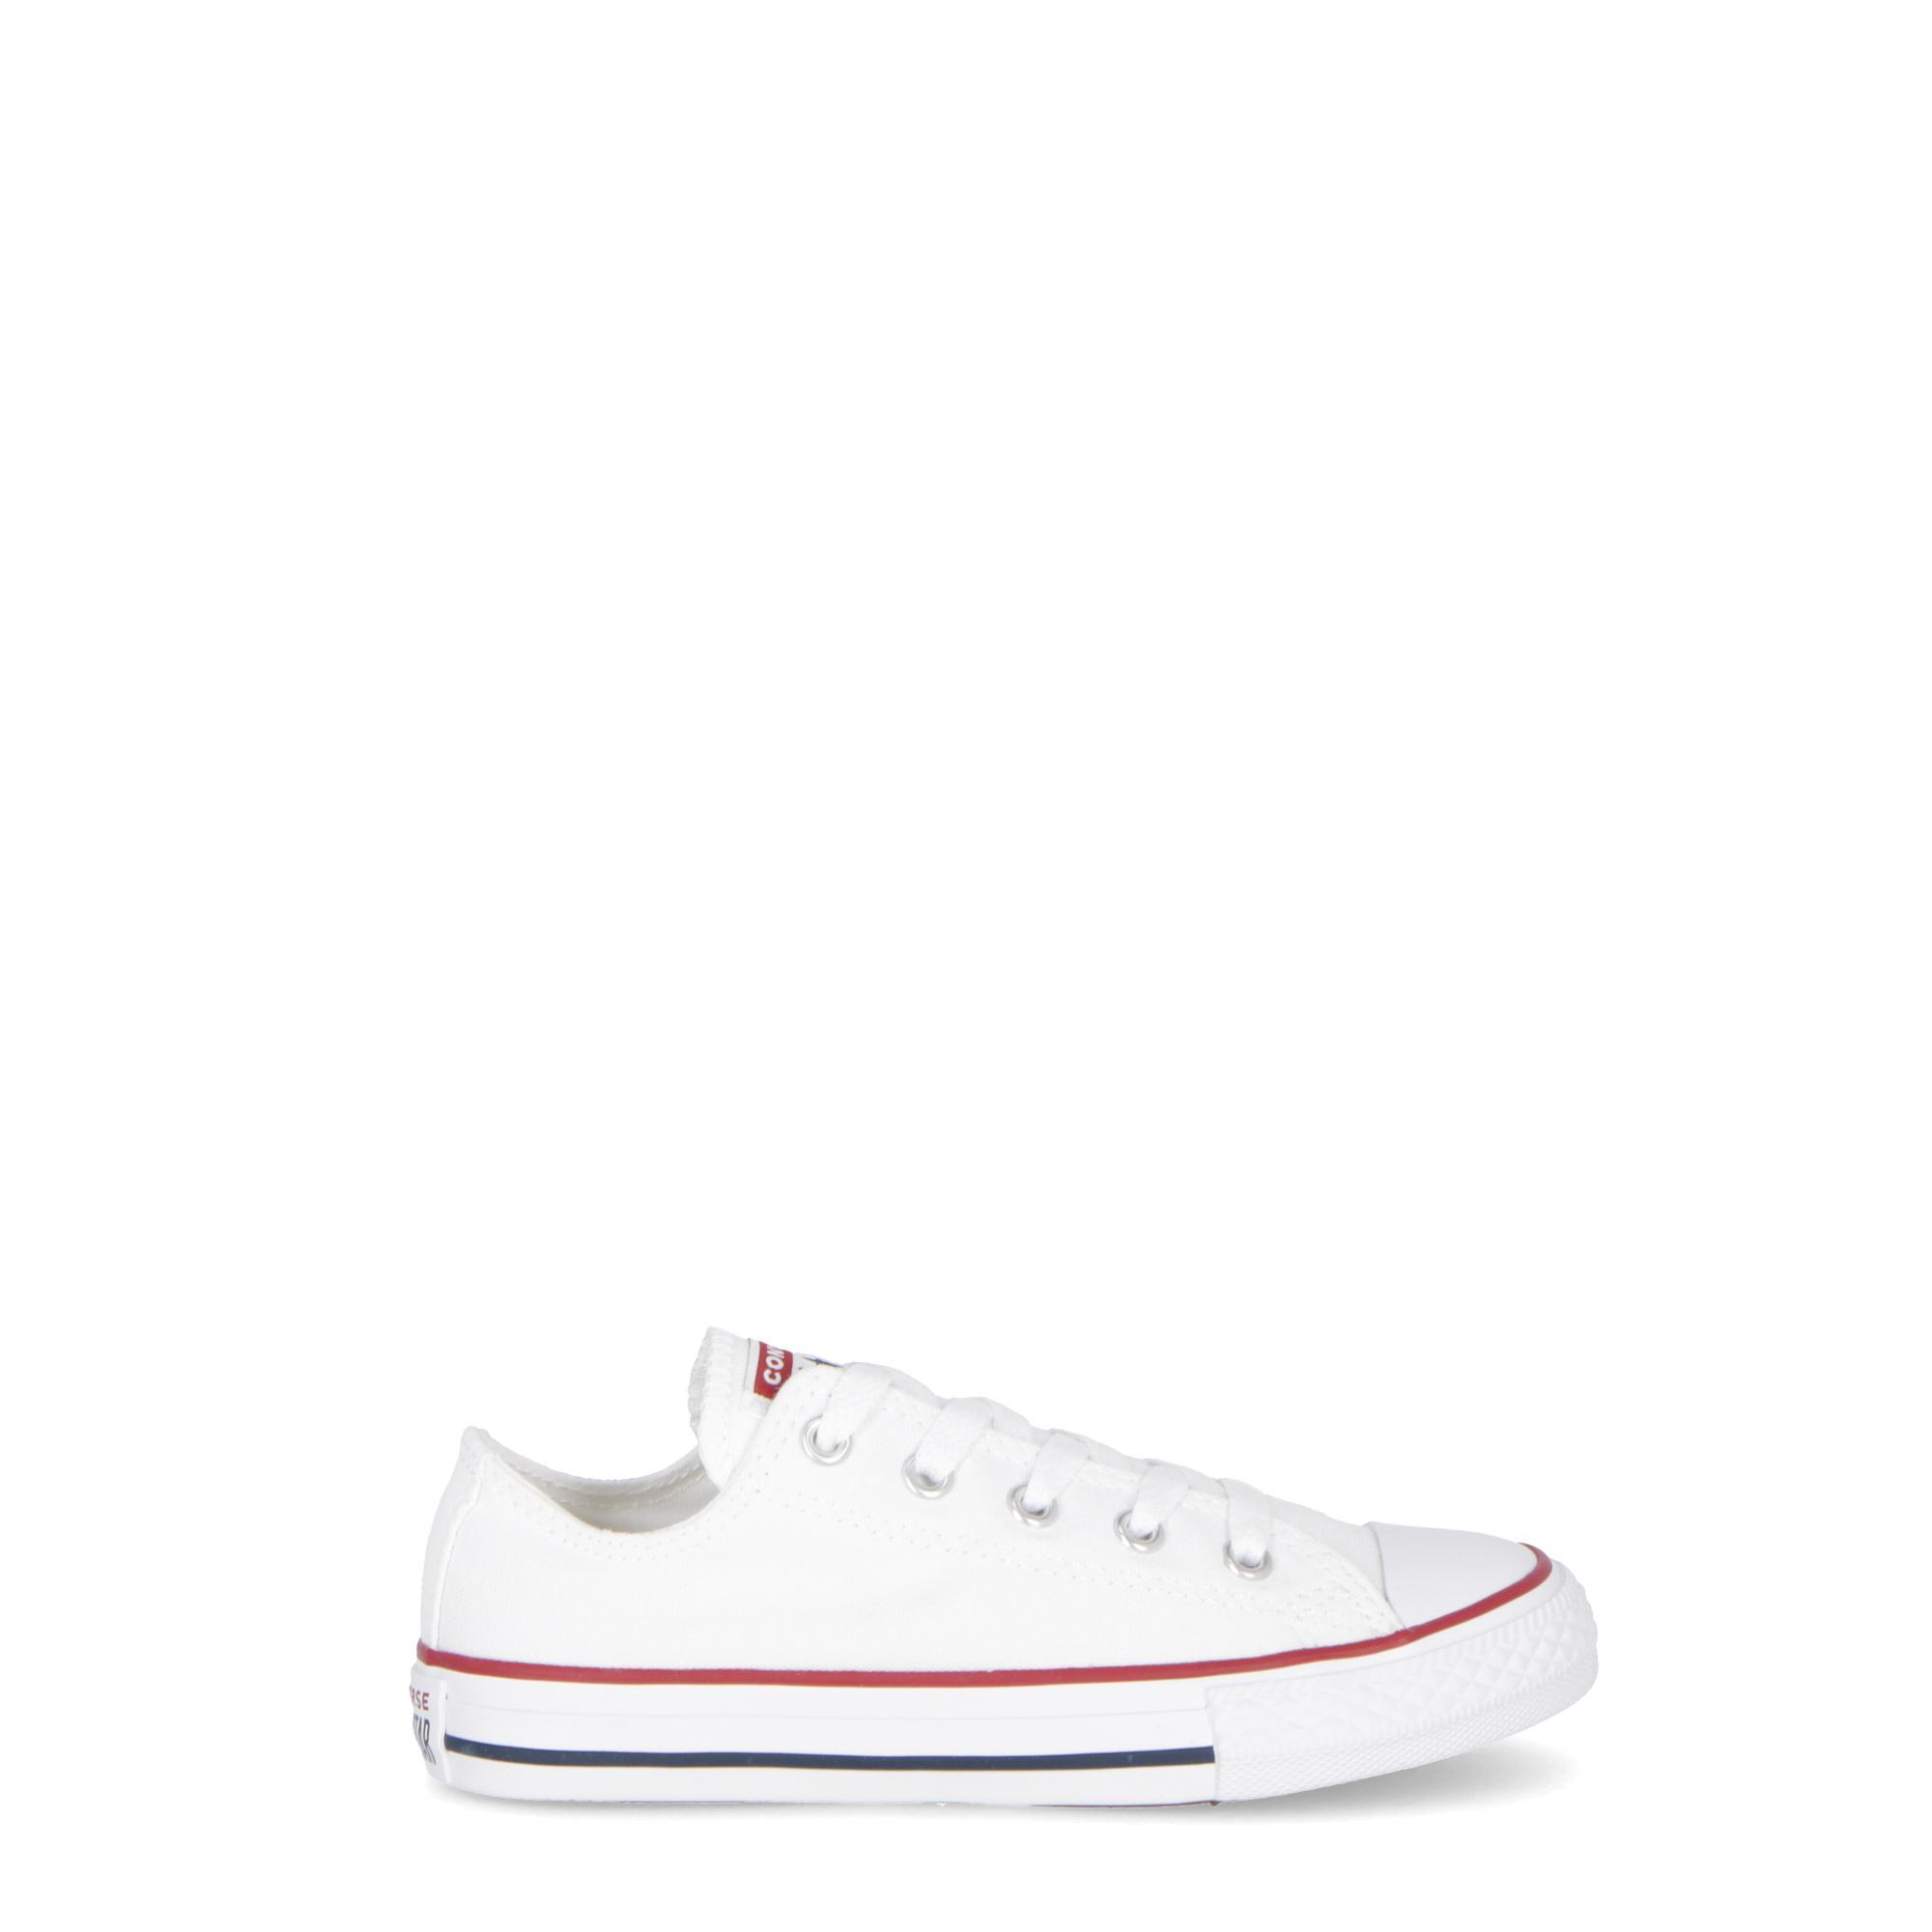 converse optical white